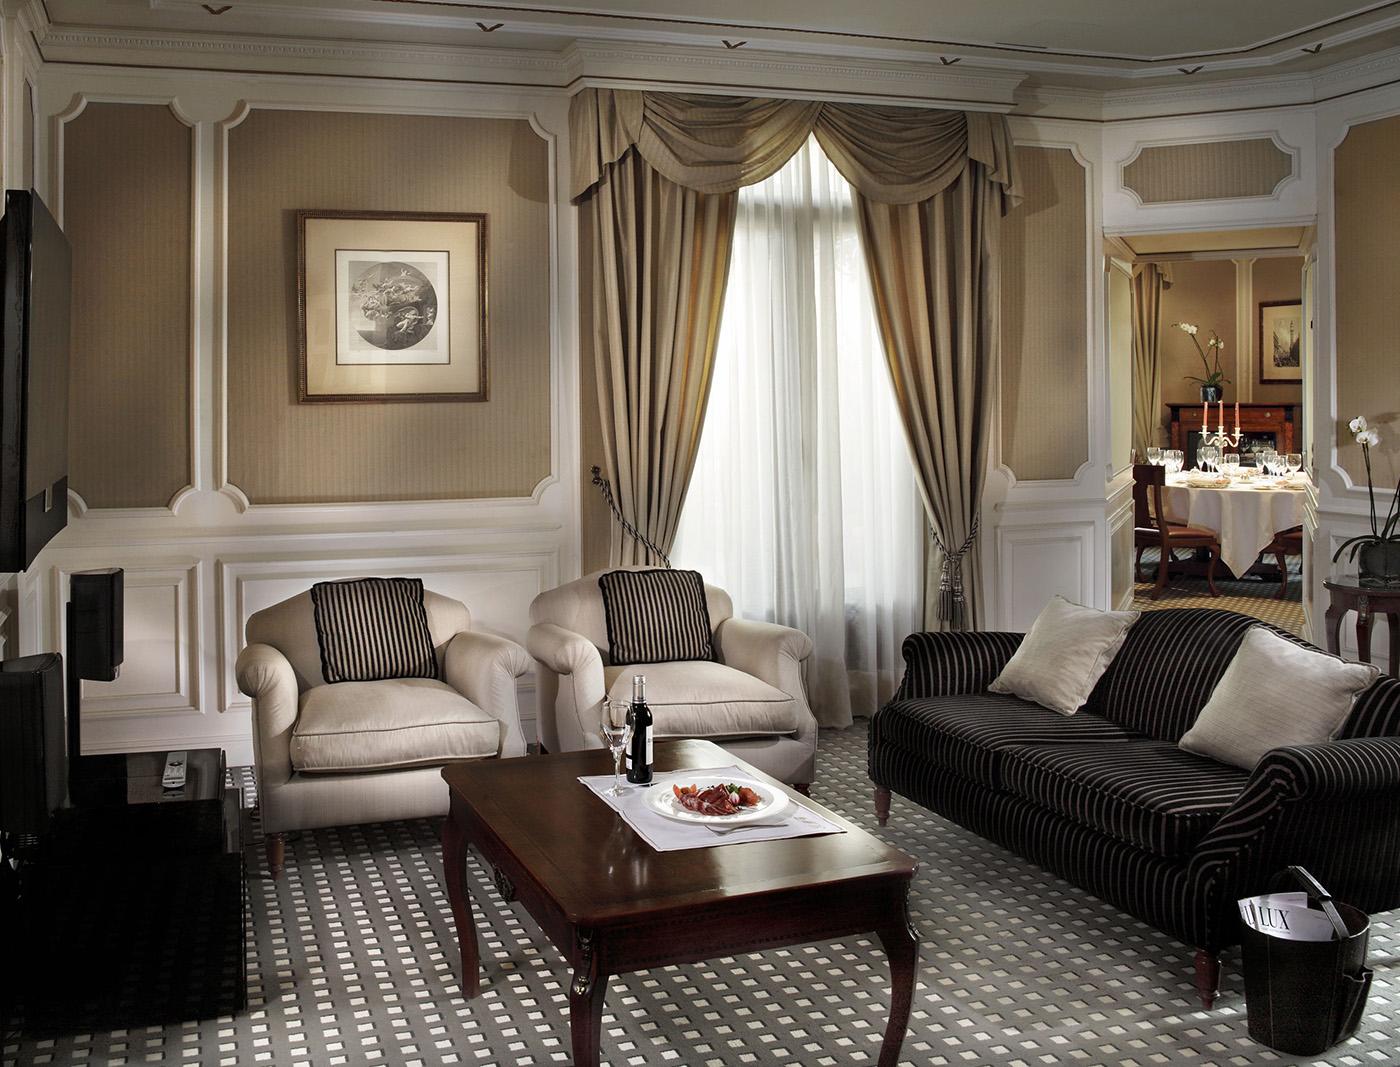 Hotel Gran Meliá Fénix 3